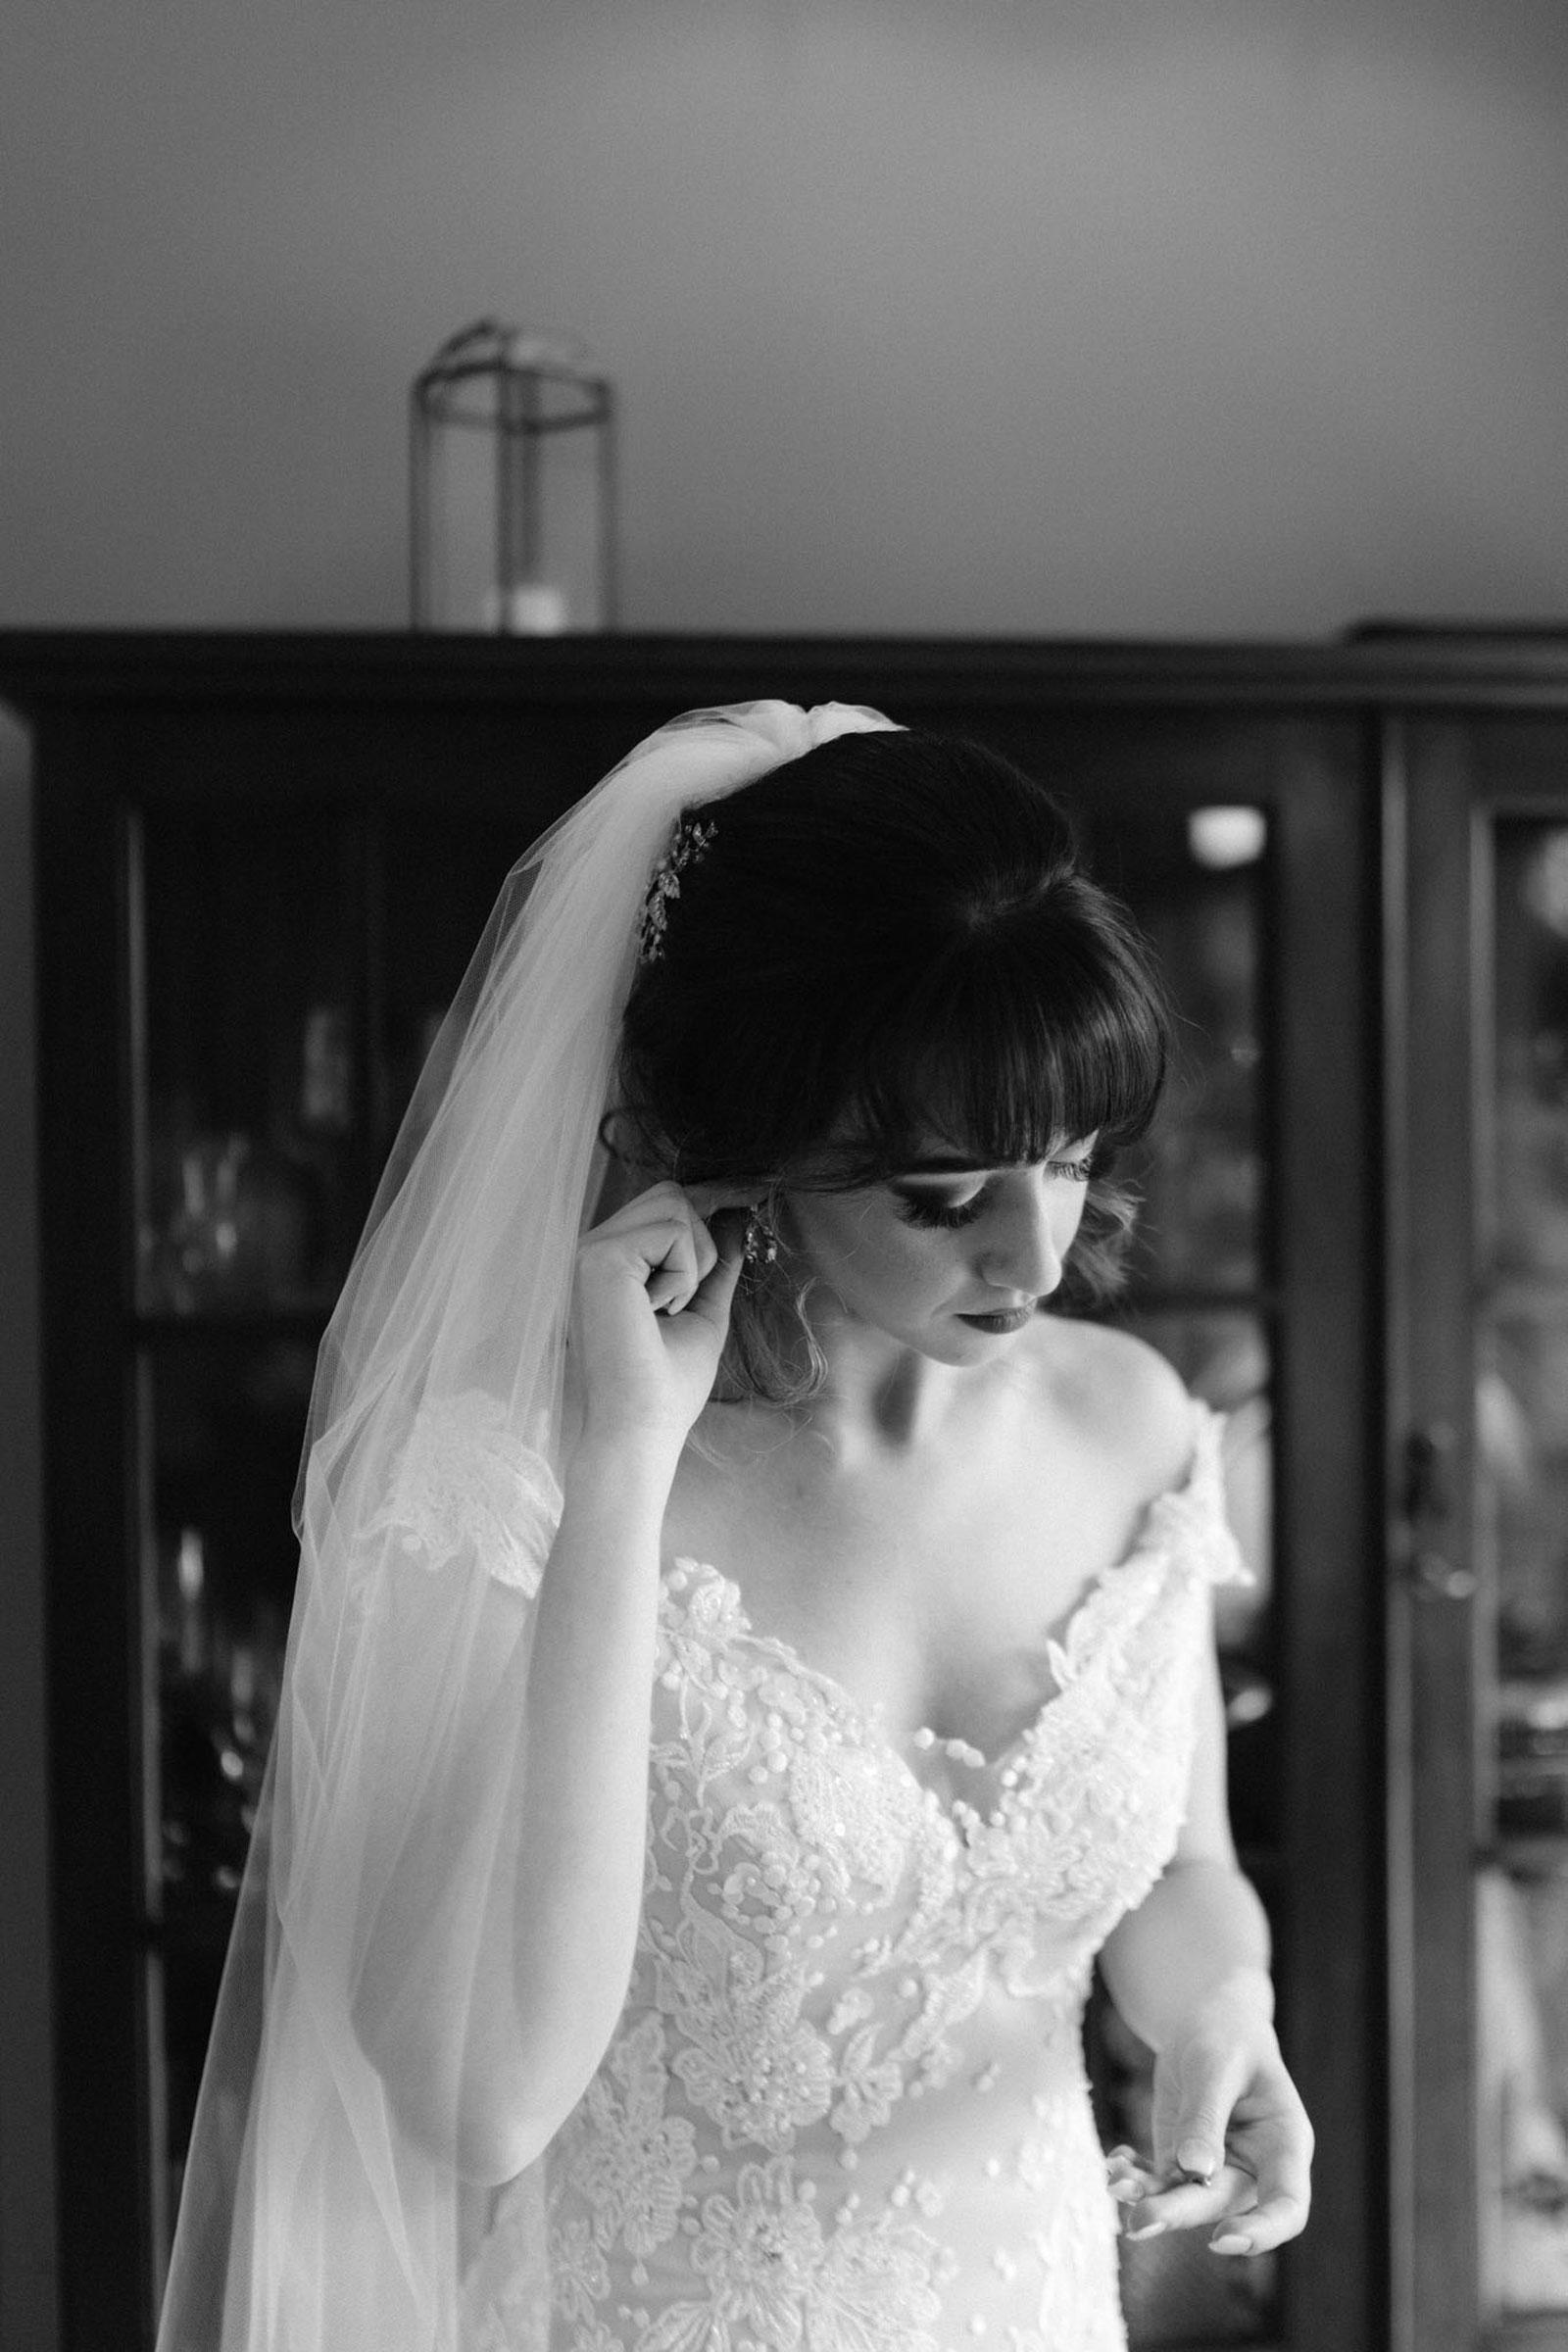 newfound-n-c-olive-tree-cottage-tauranga-wedding-photographer-165A